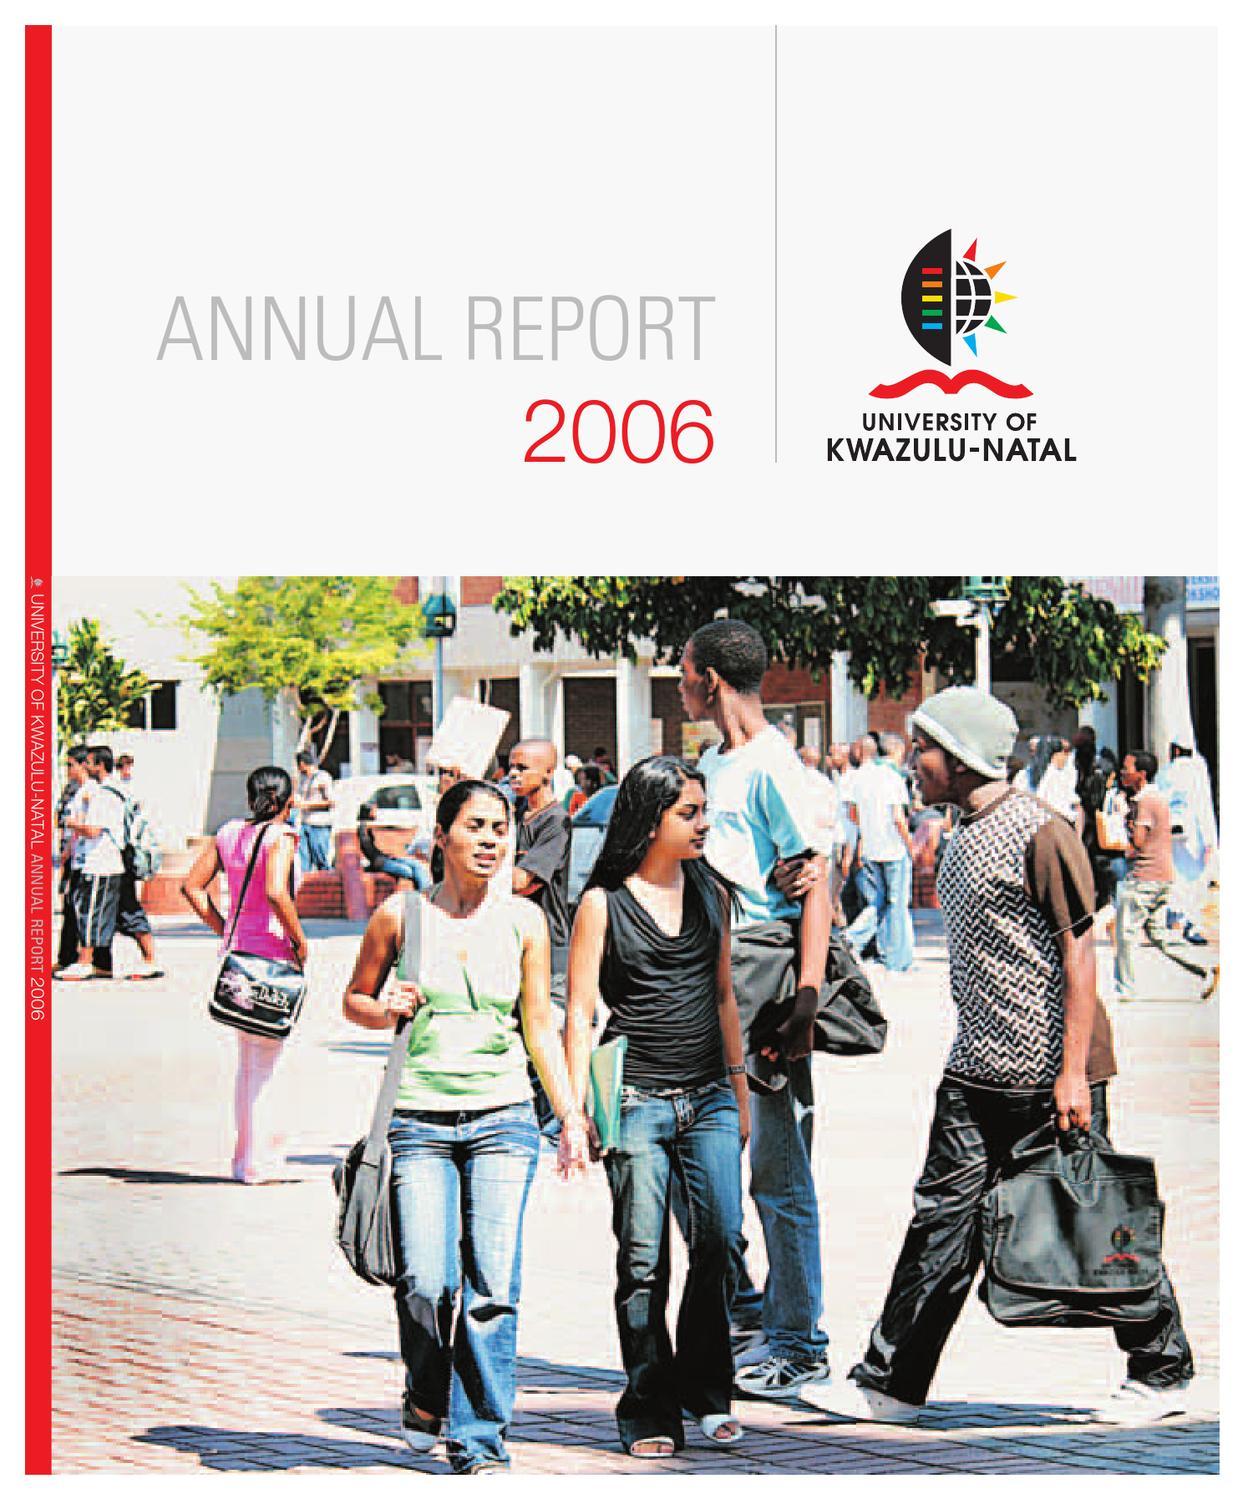 Ukzn Annual Report 2006 By Nitesh Ramsaroop Issuu